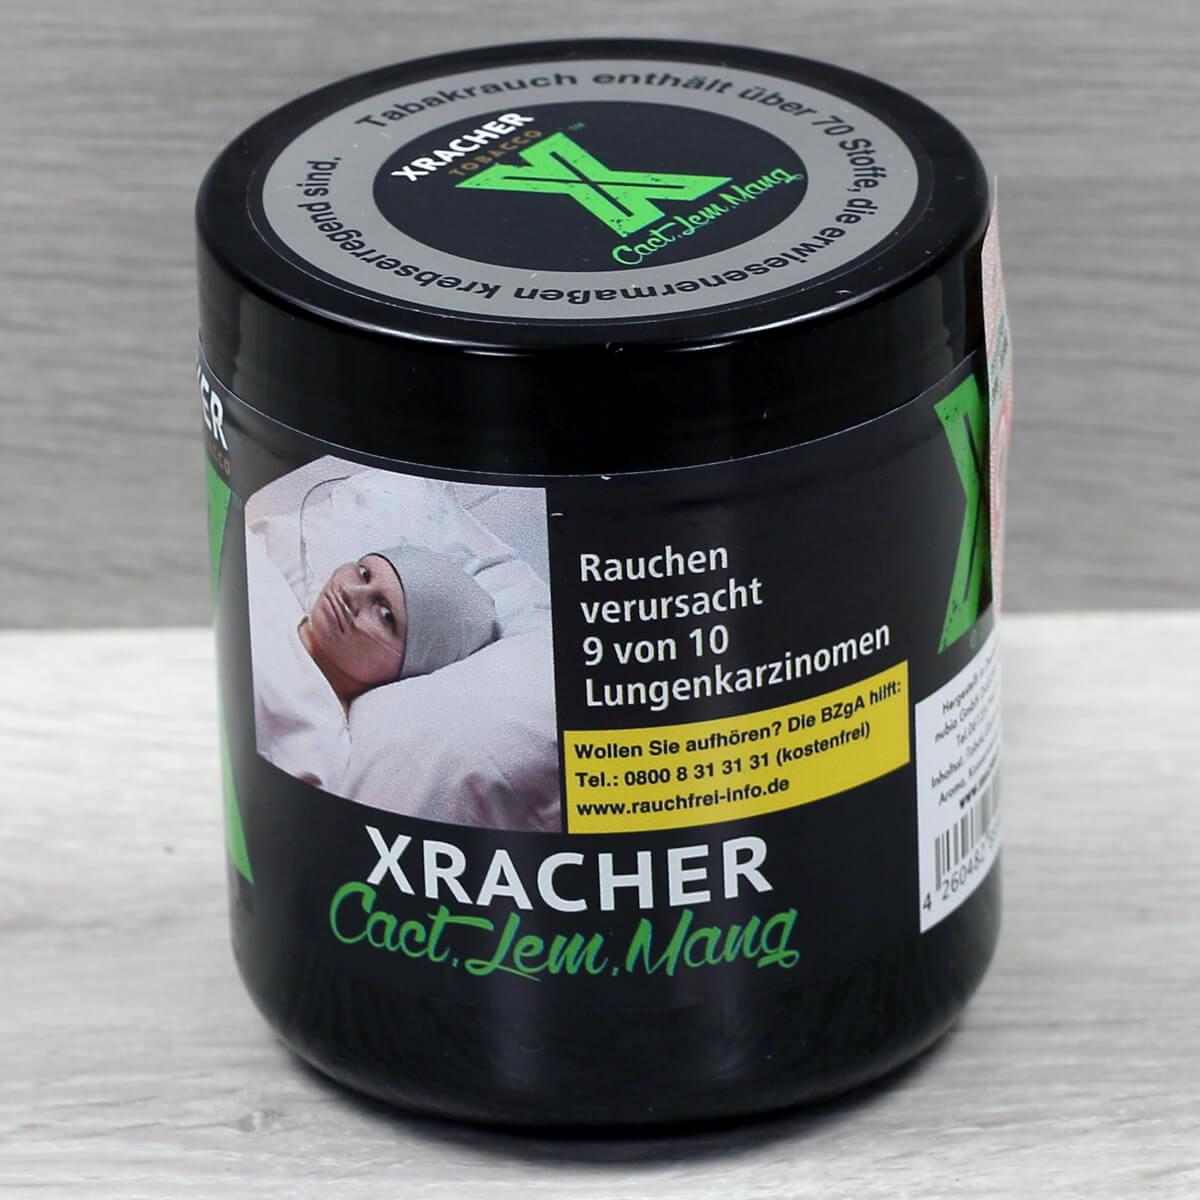 XRacher Tobacco - CactJemMang 200g